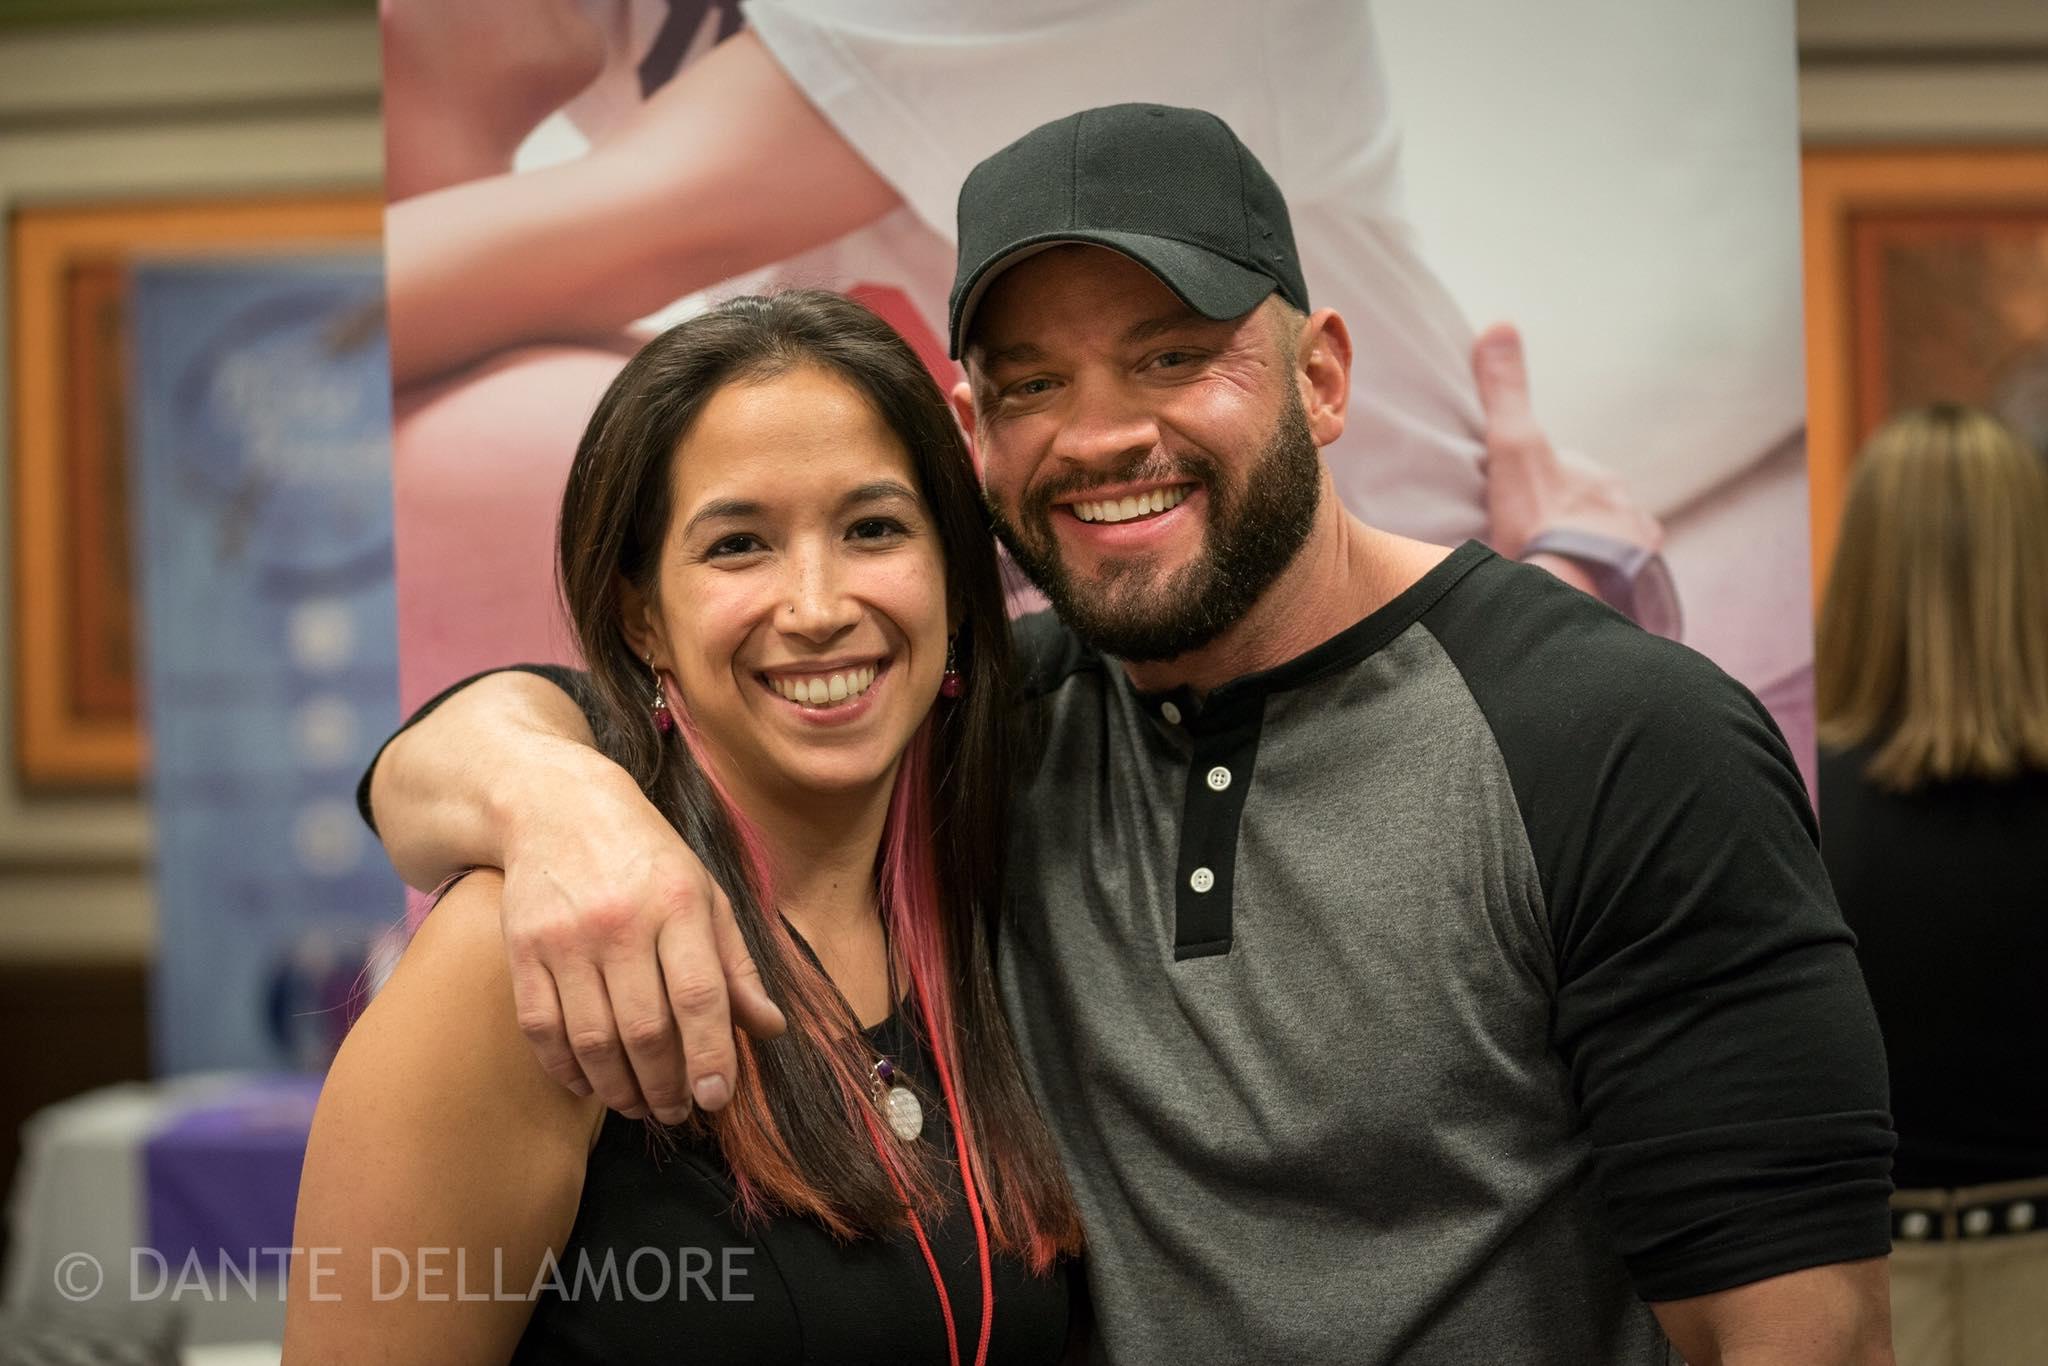 Dante Dellamore AJ Renee Robert Kelly Authors and Dancers against Cancer 2019